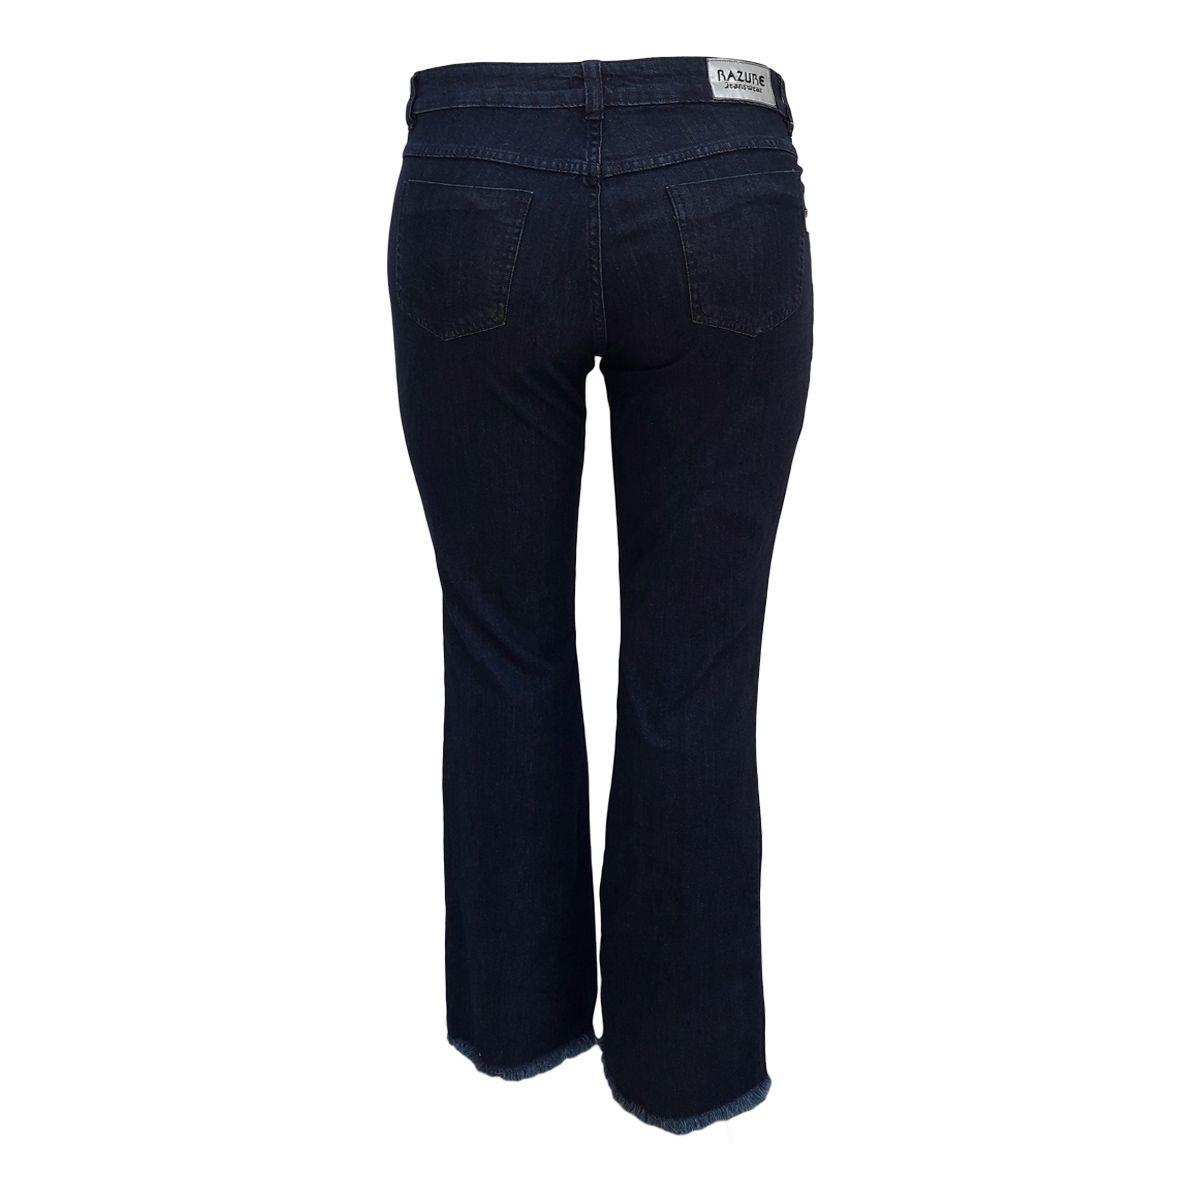 Kit 02 Calças Jeans Femininas Cigarrete e Boot Cut Plus Size 48